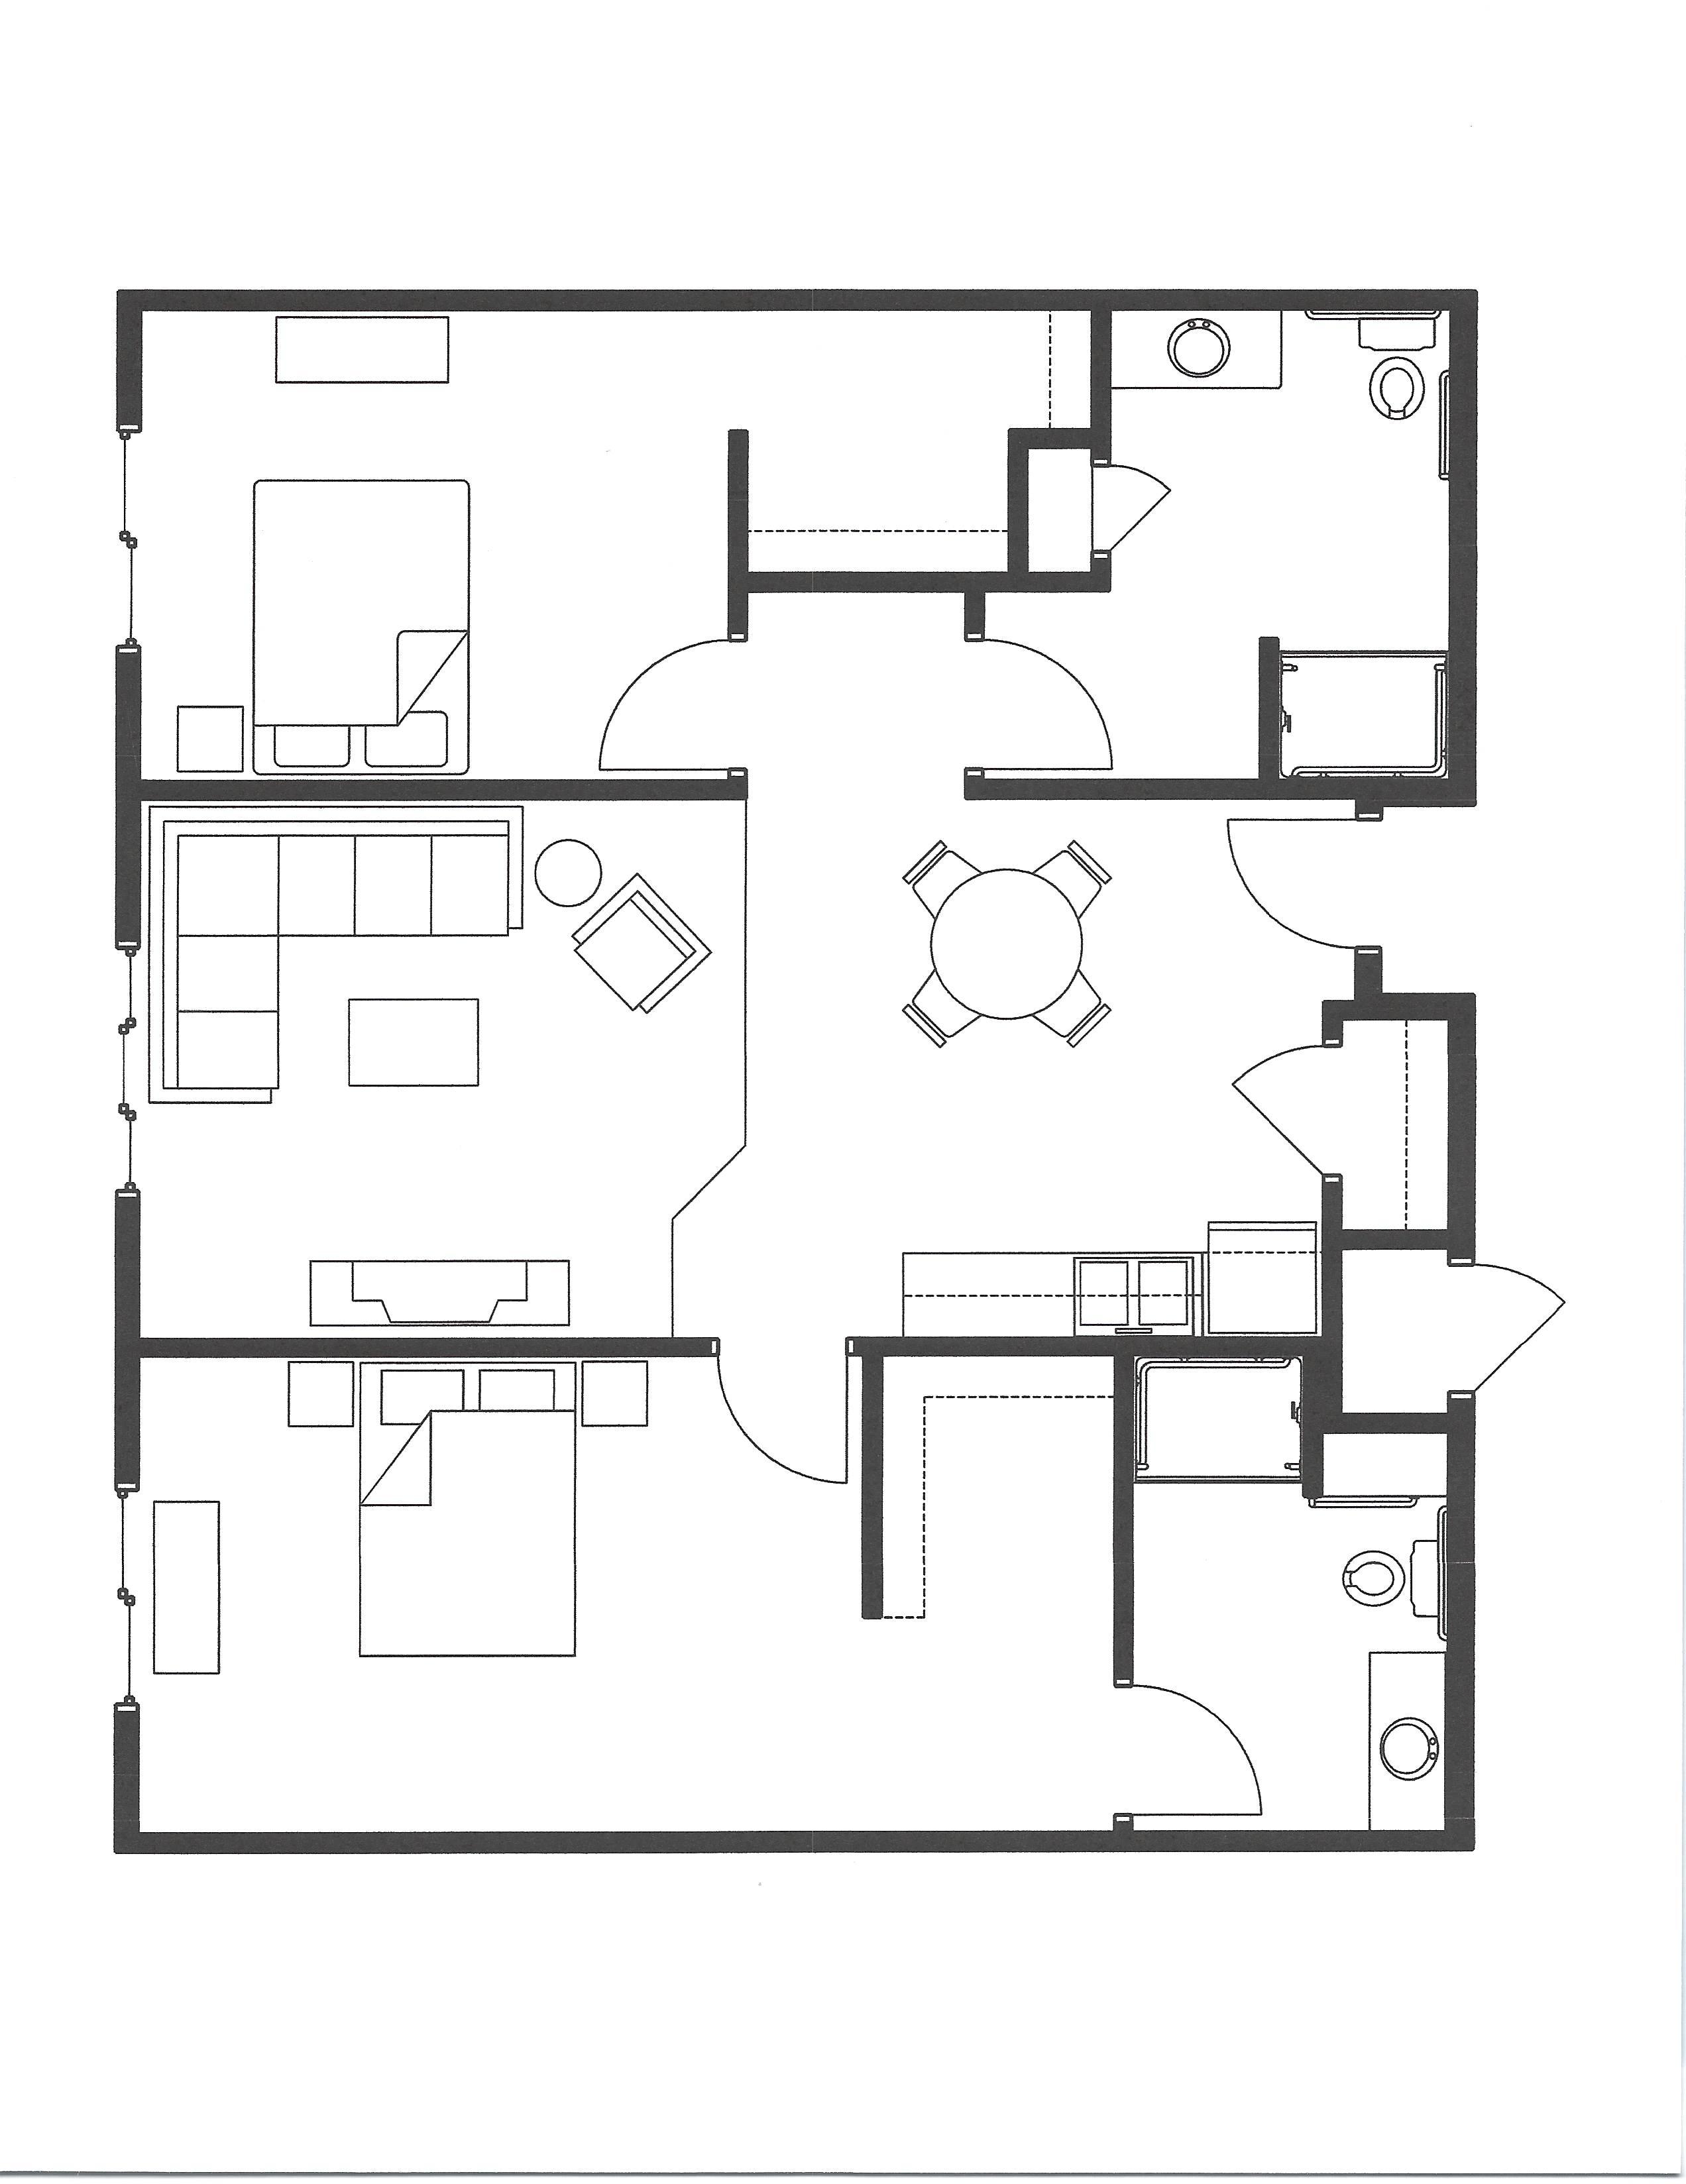 al two bedroom